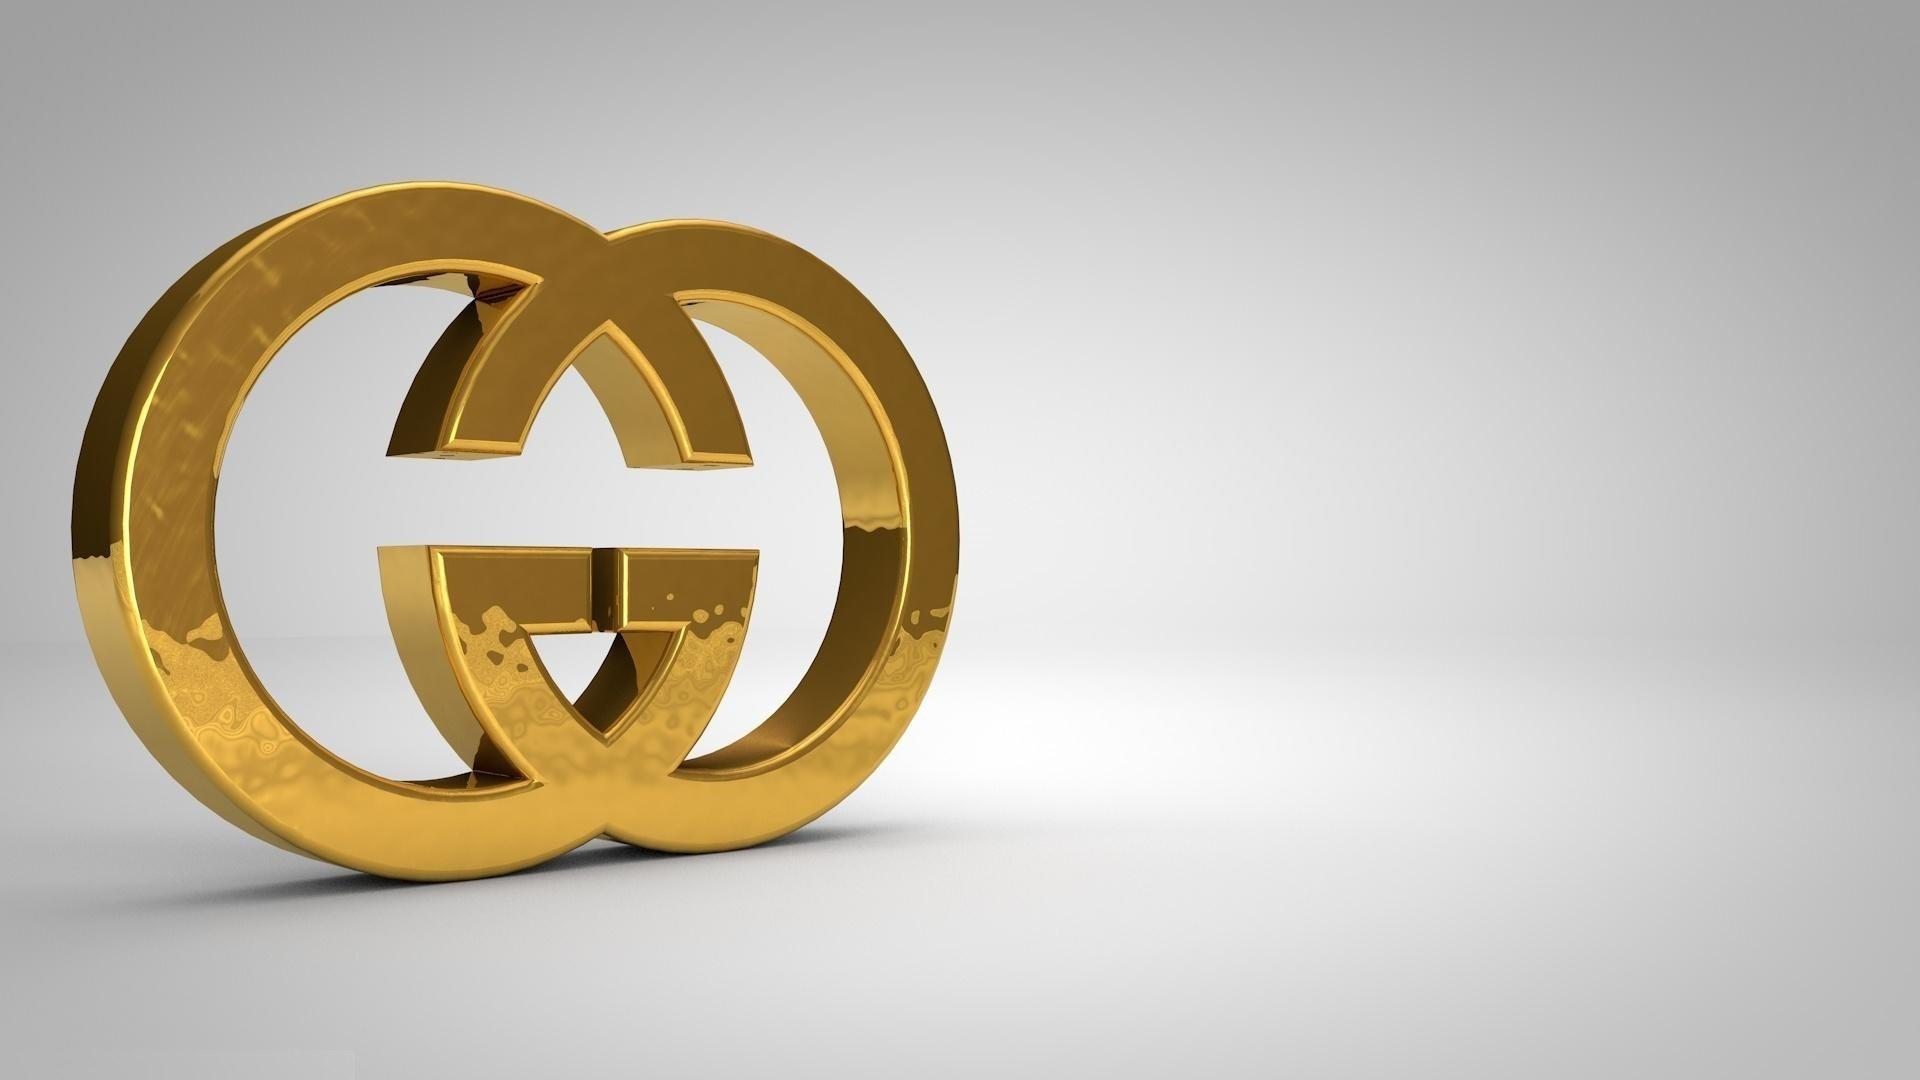 Gucci logo wallpaper 63 images for Gold 3d wallpaper